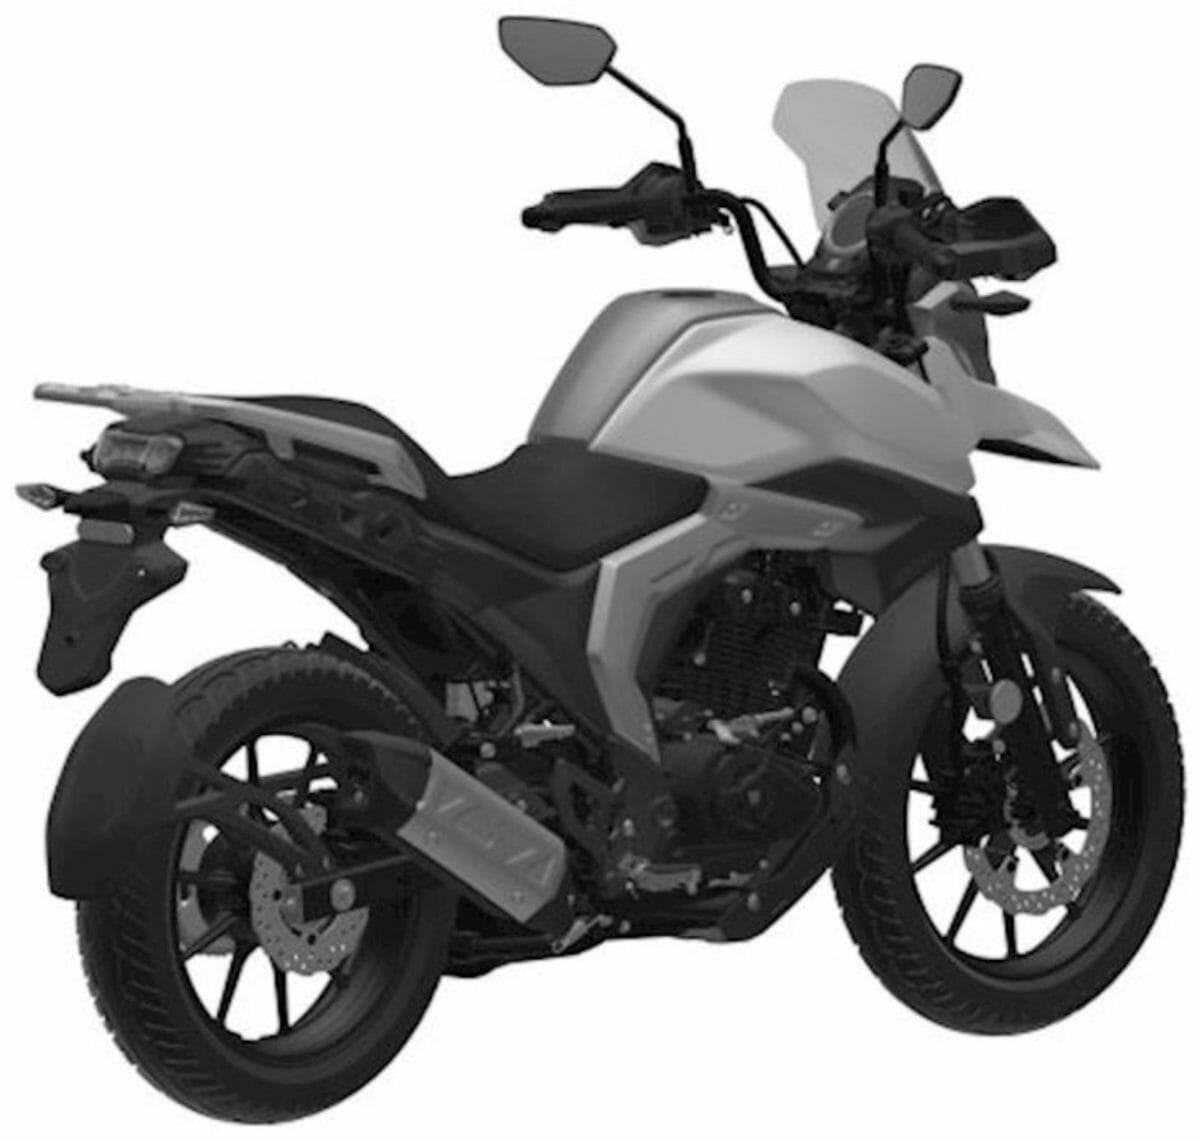 Suzuki V Strom 160 patent (3)